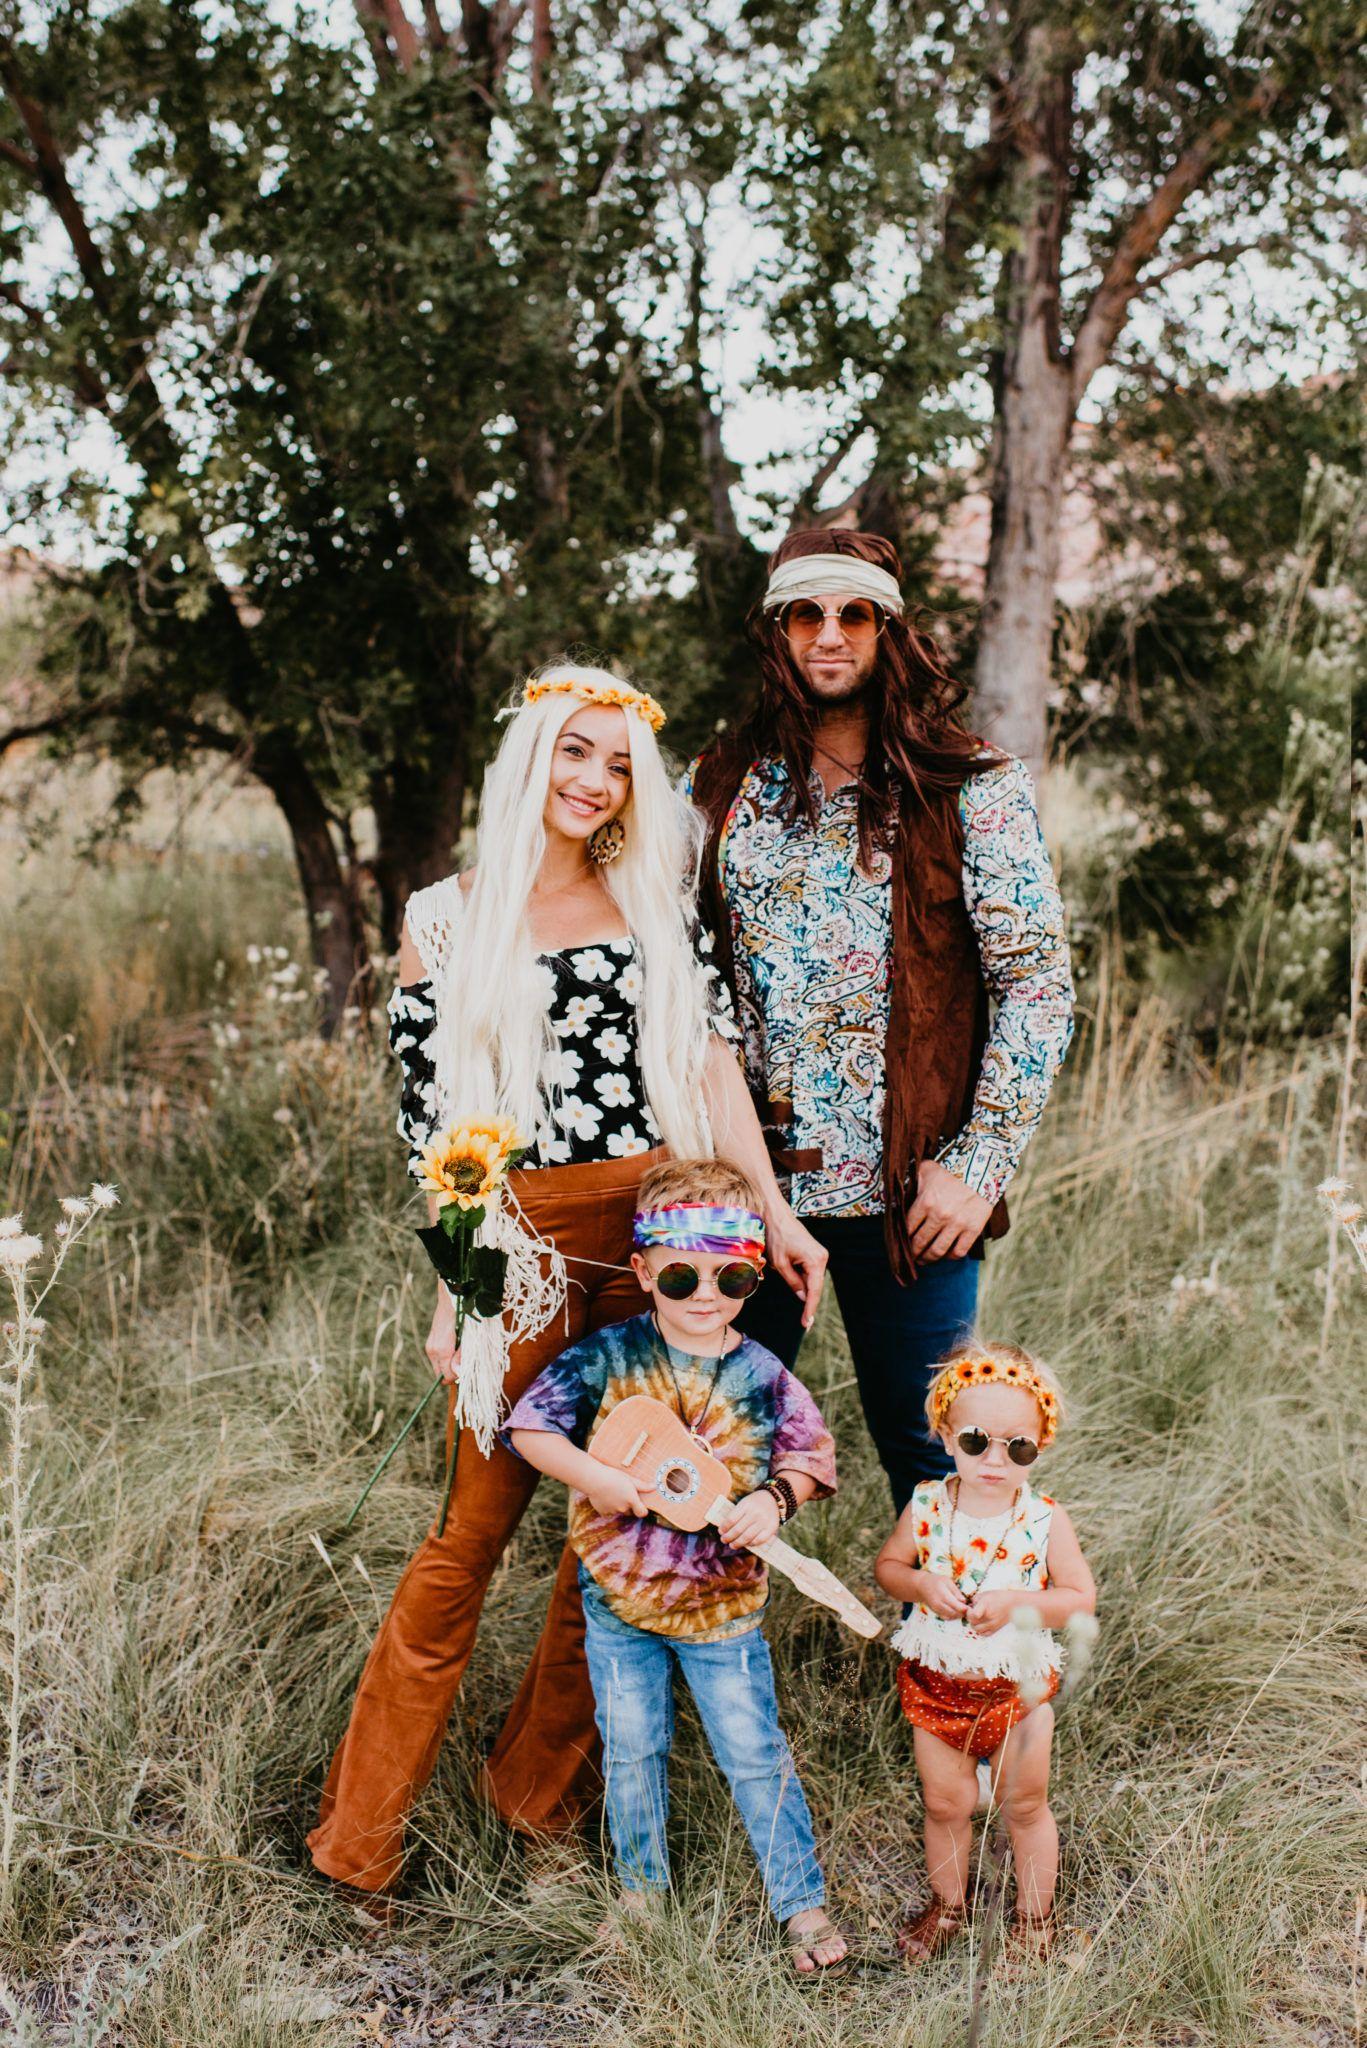 19 Diy Hippie Costume Ideas Hippie Halloween Costumes You Can Diy